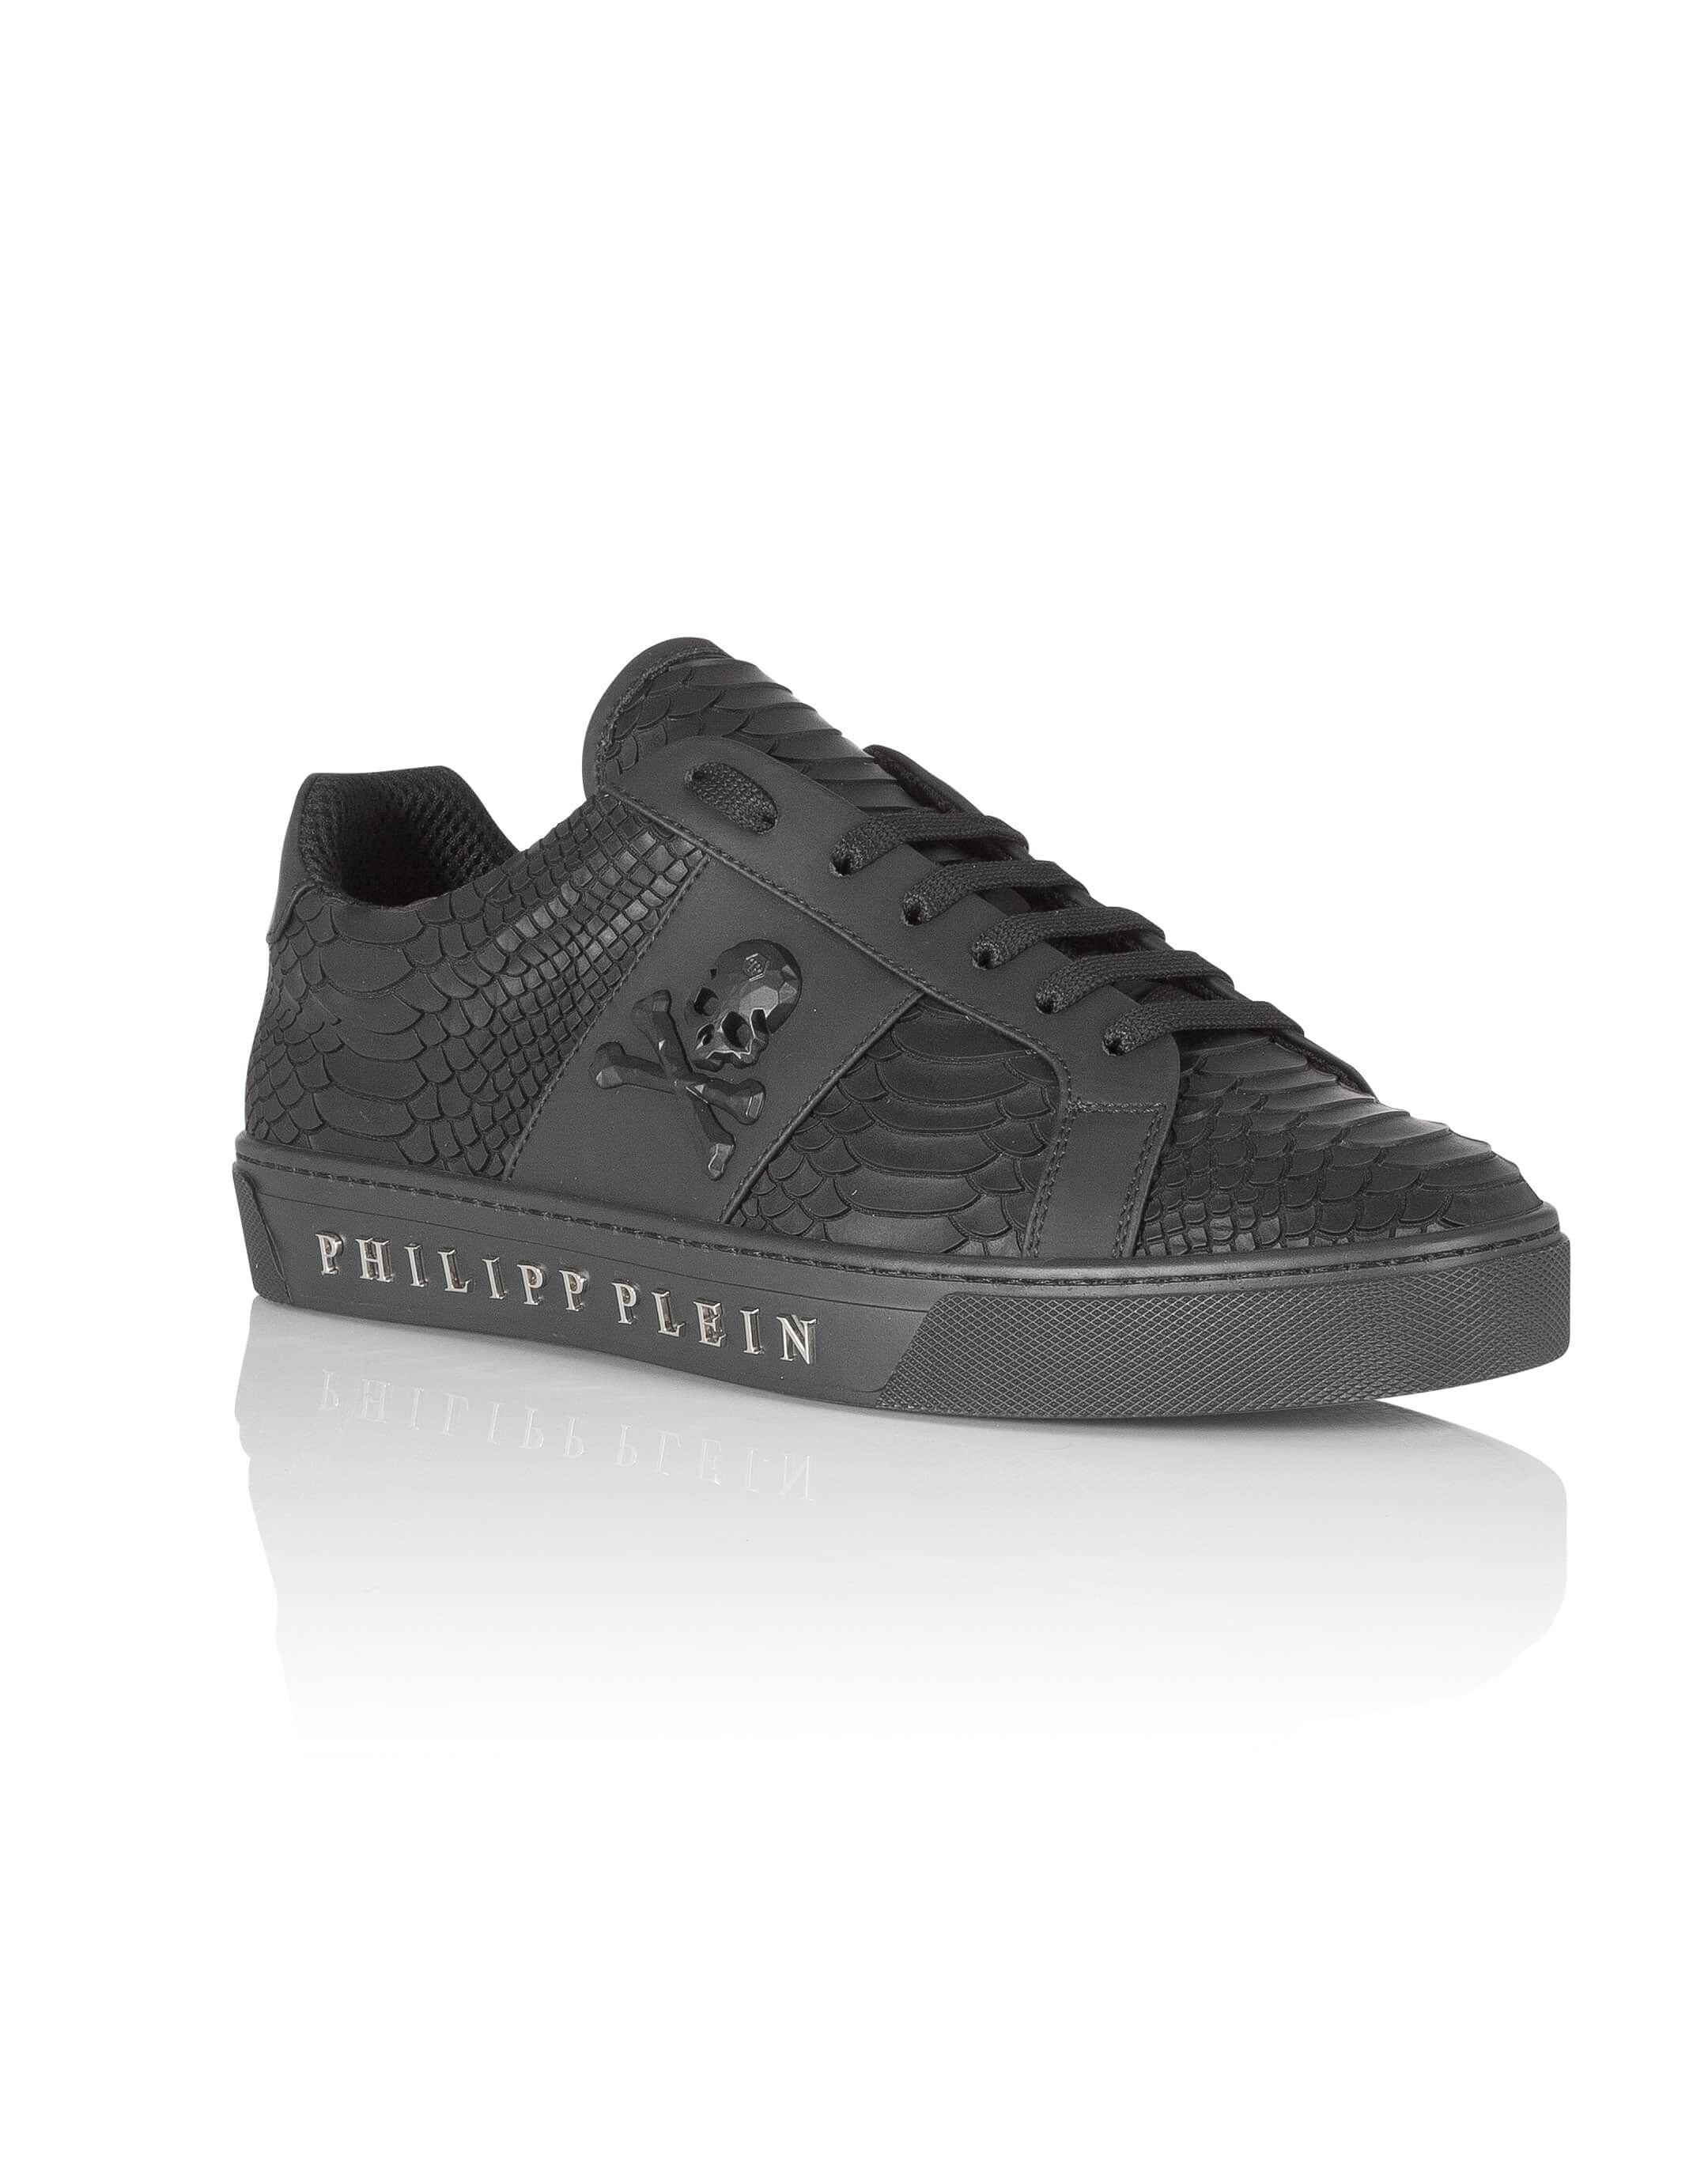 Philipp Plein Low top sneakers